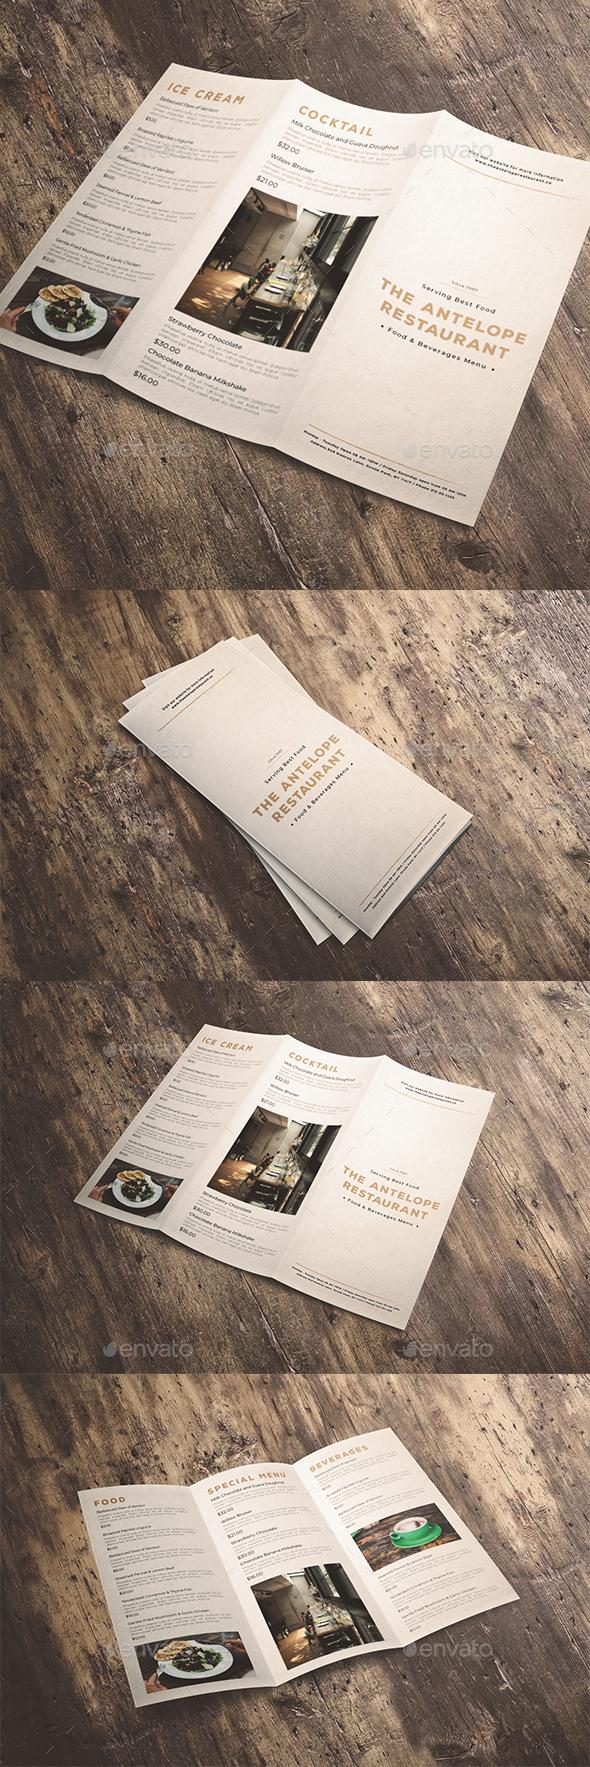 Classic Trifold Brochure Menu - Food Menus Print Templates